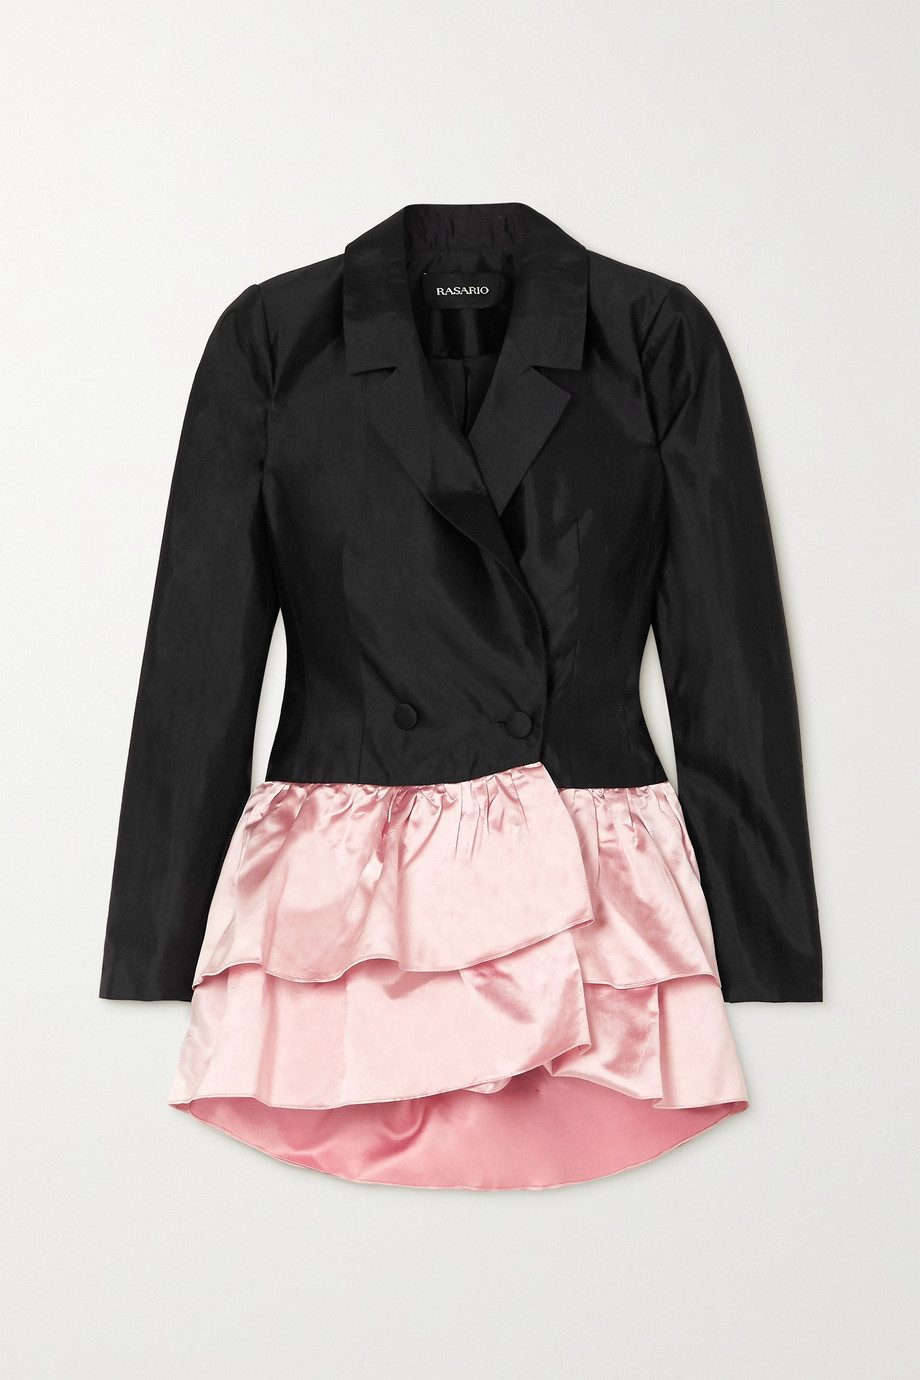 RASARIO Two-tone ruffled duchesse silk-satin blazer